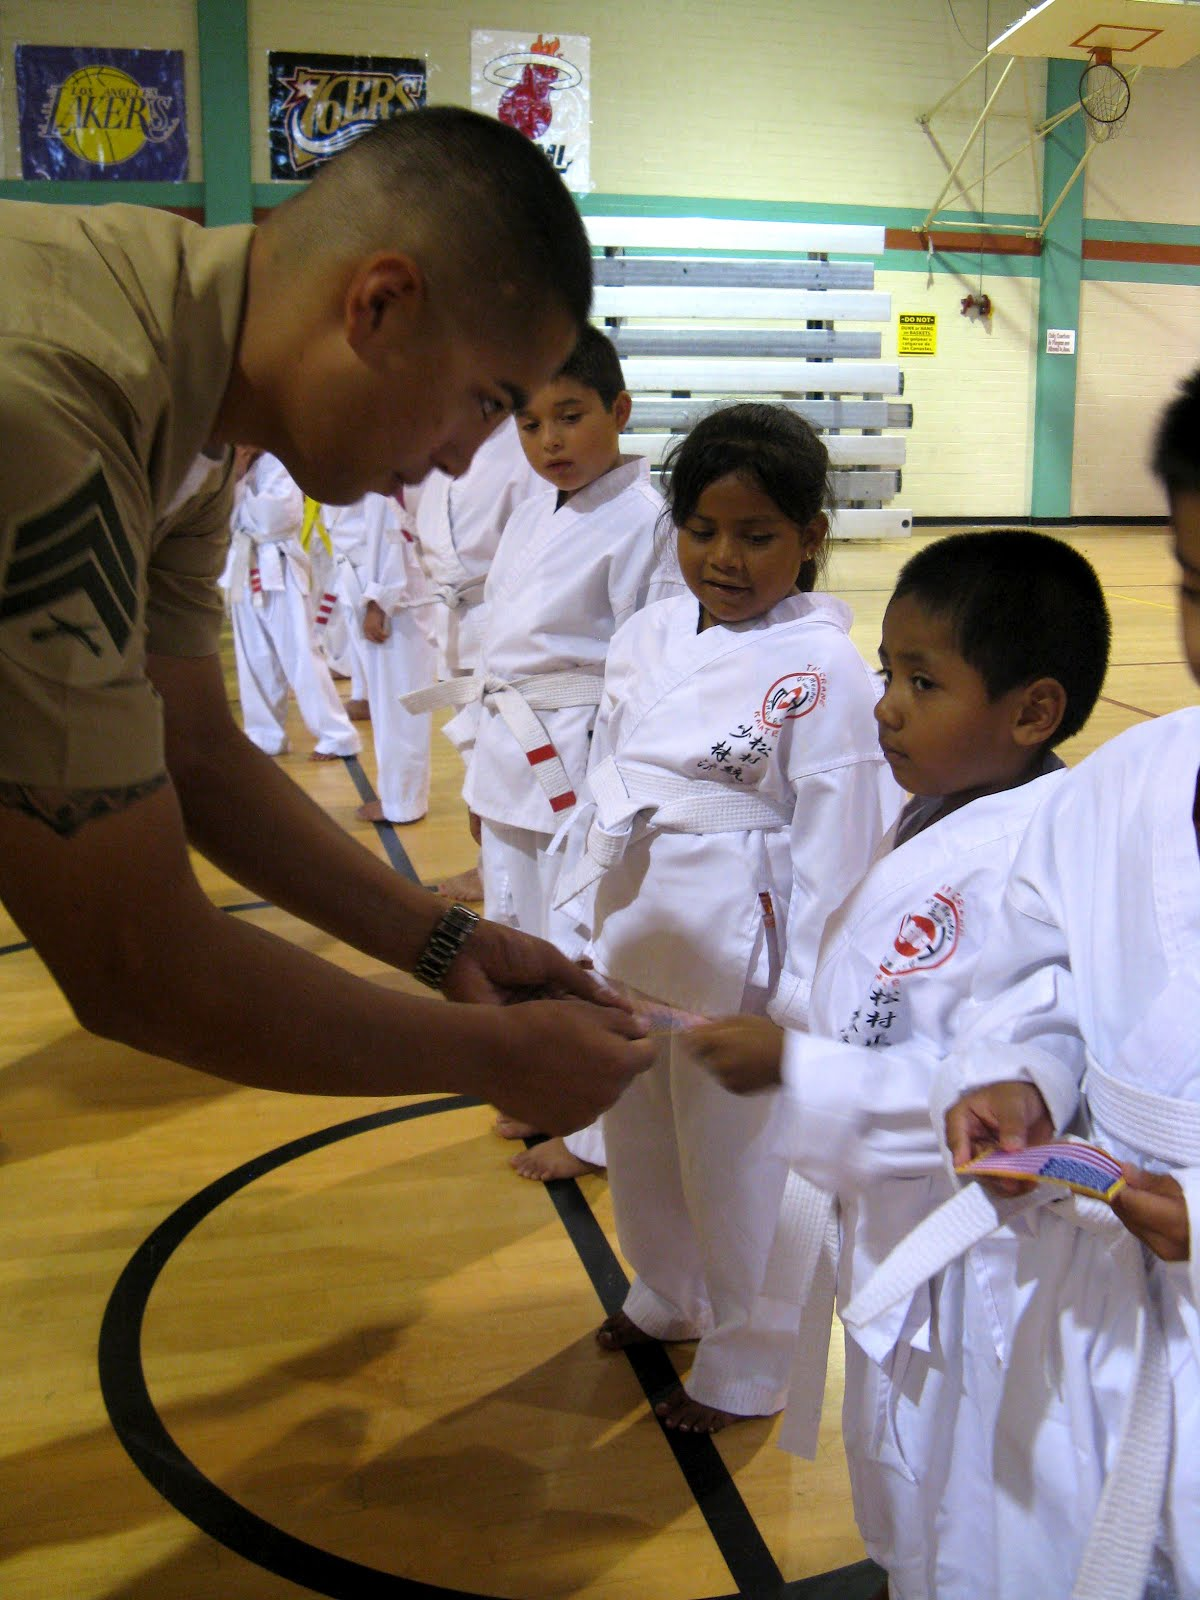 American Cadre Karate School Patches Wwwmiifotoscom